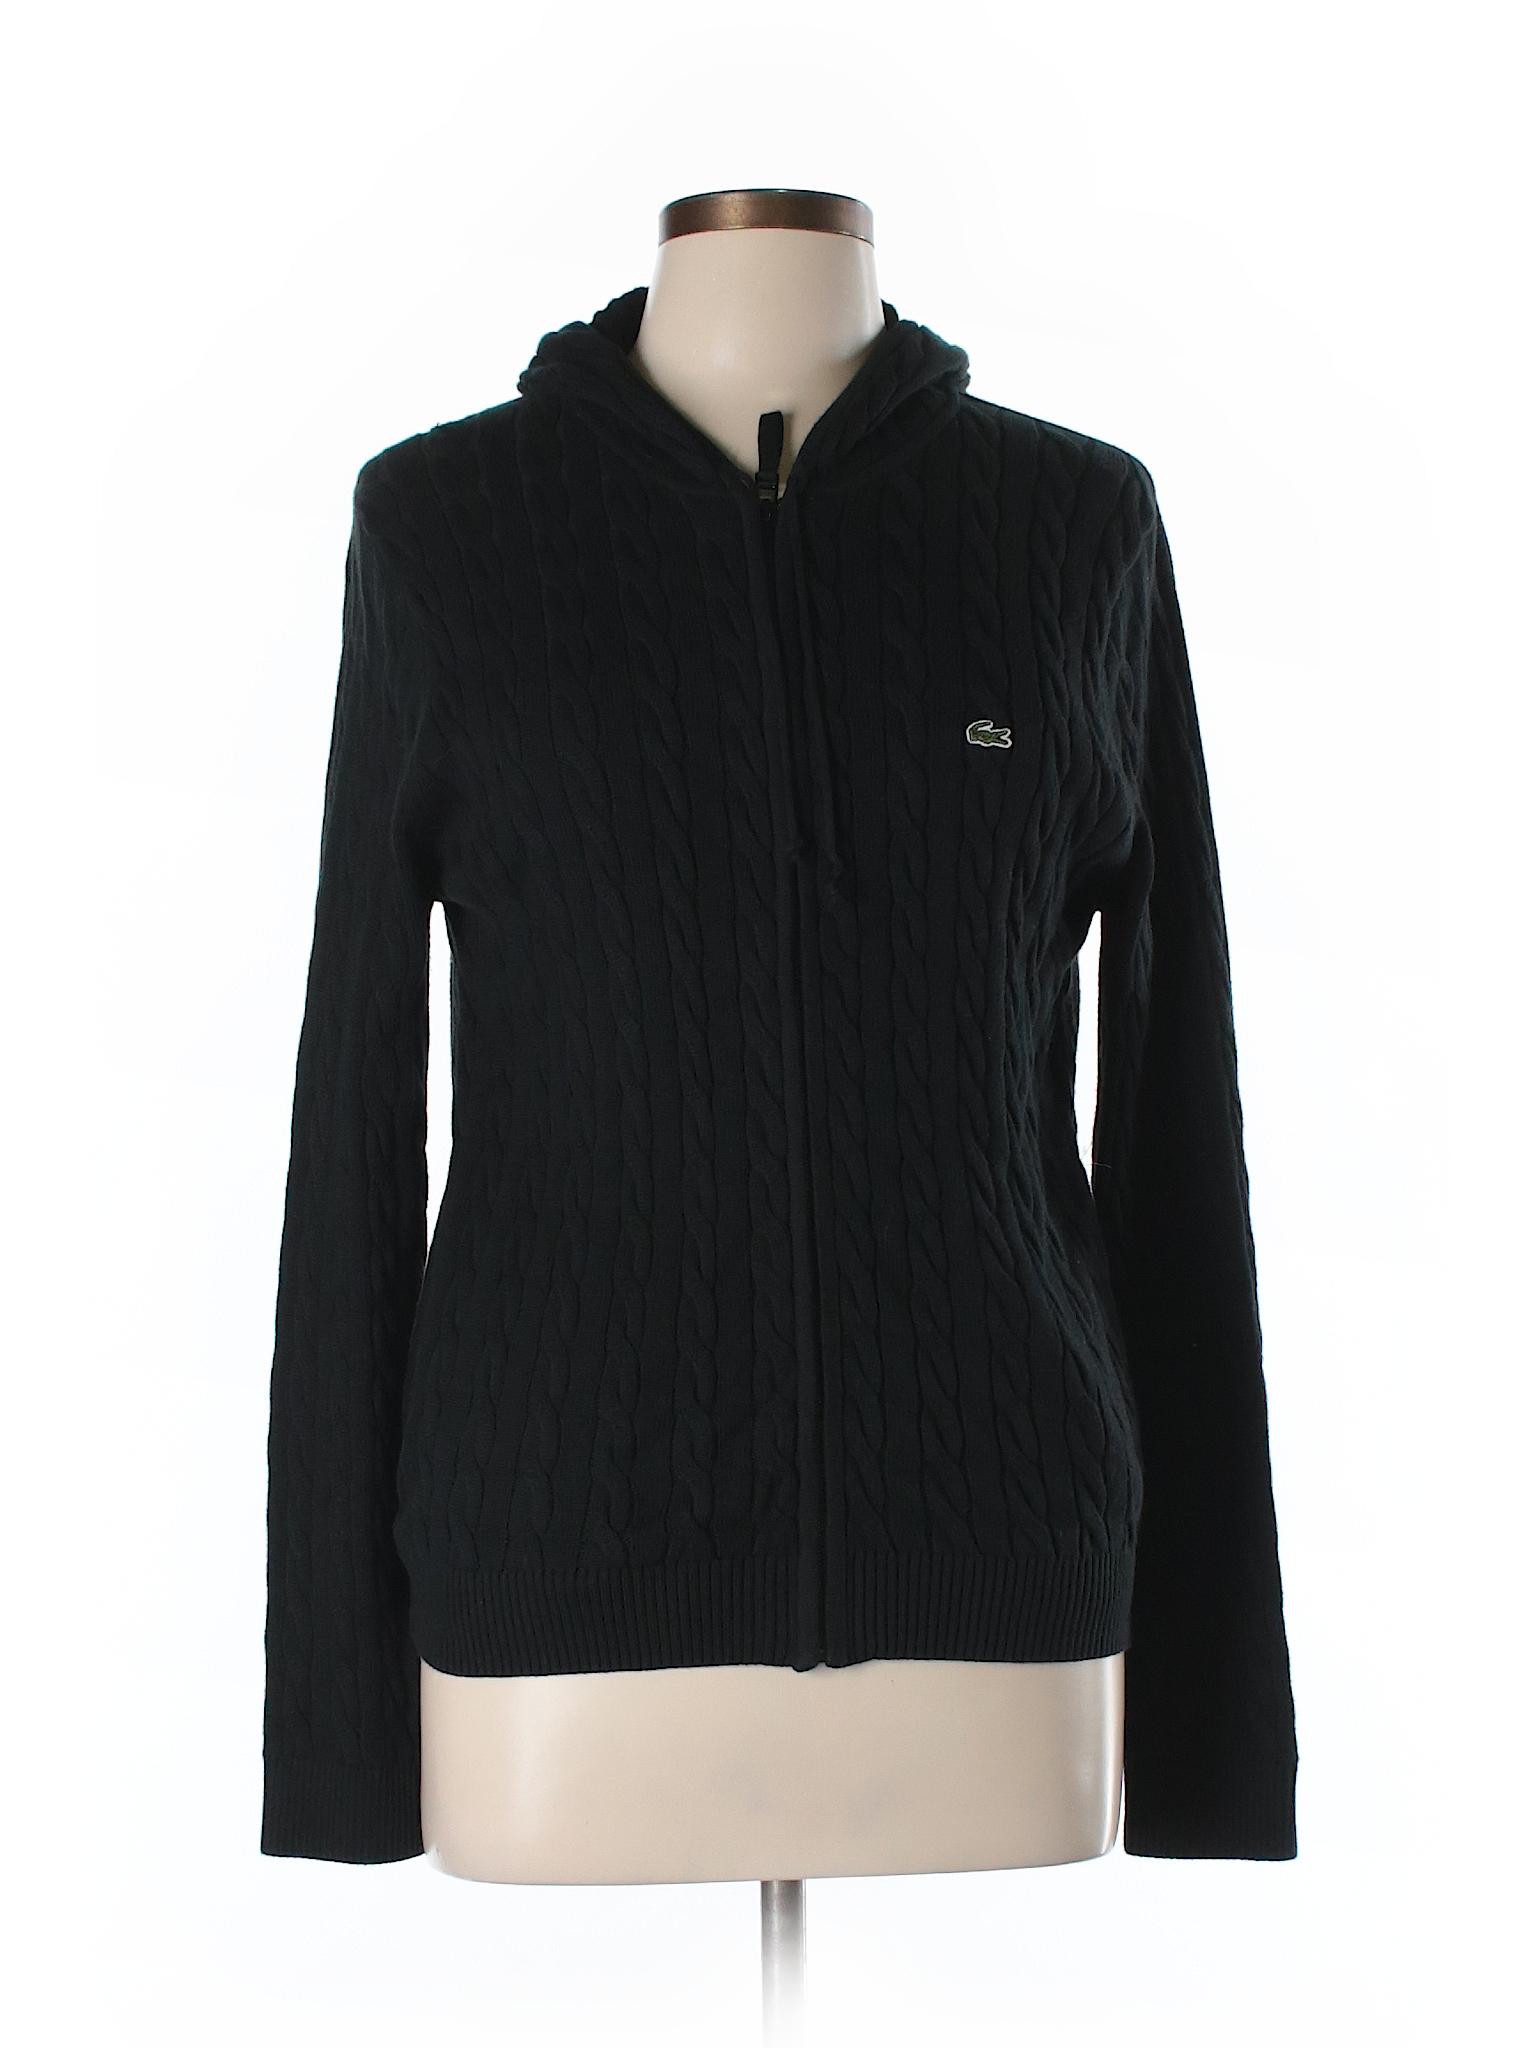 lacoste zip up hoodie 83 off only on thredup. Black Bedroom Furniture Sets. Home Design Ideas